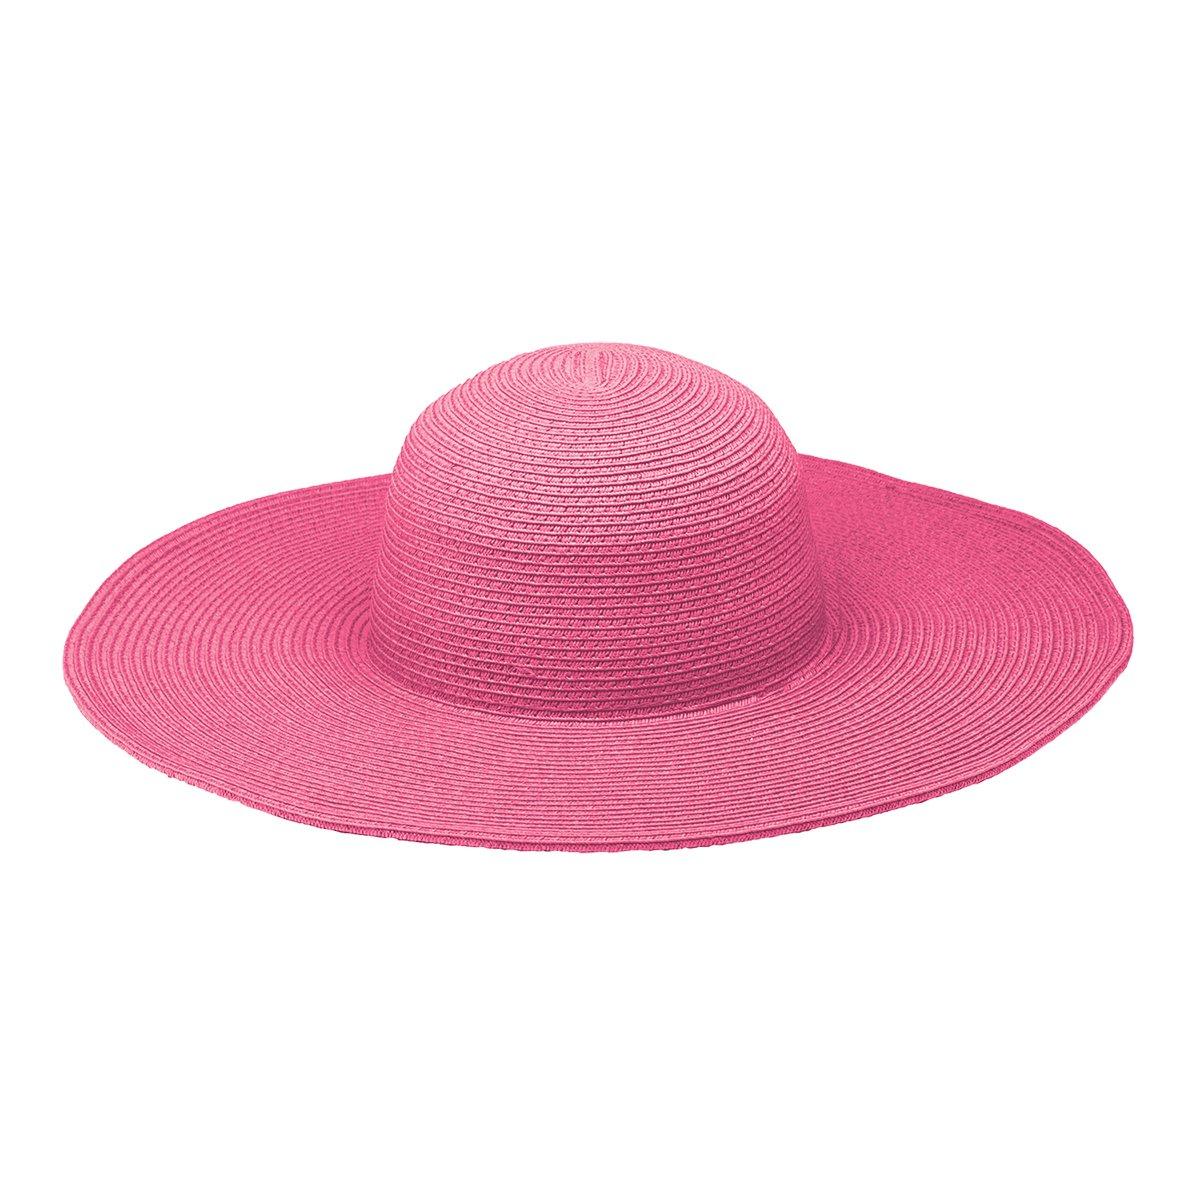 Peter Grimm Women's Erin Resort Sun Hat - Fushia